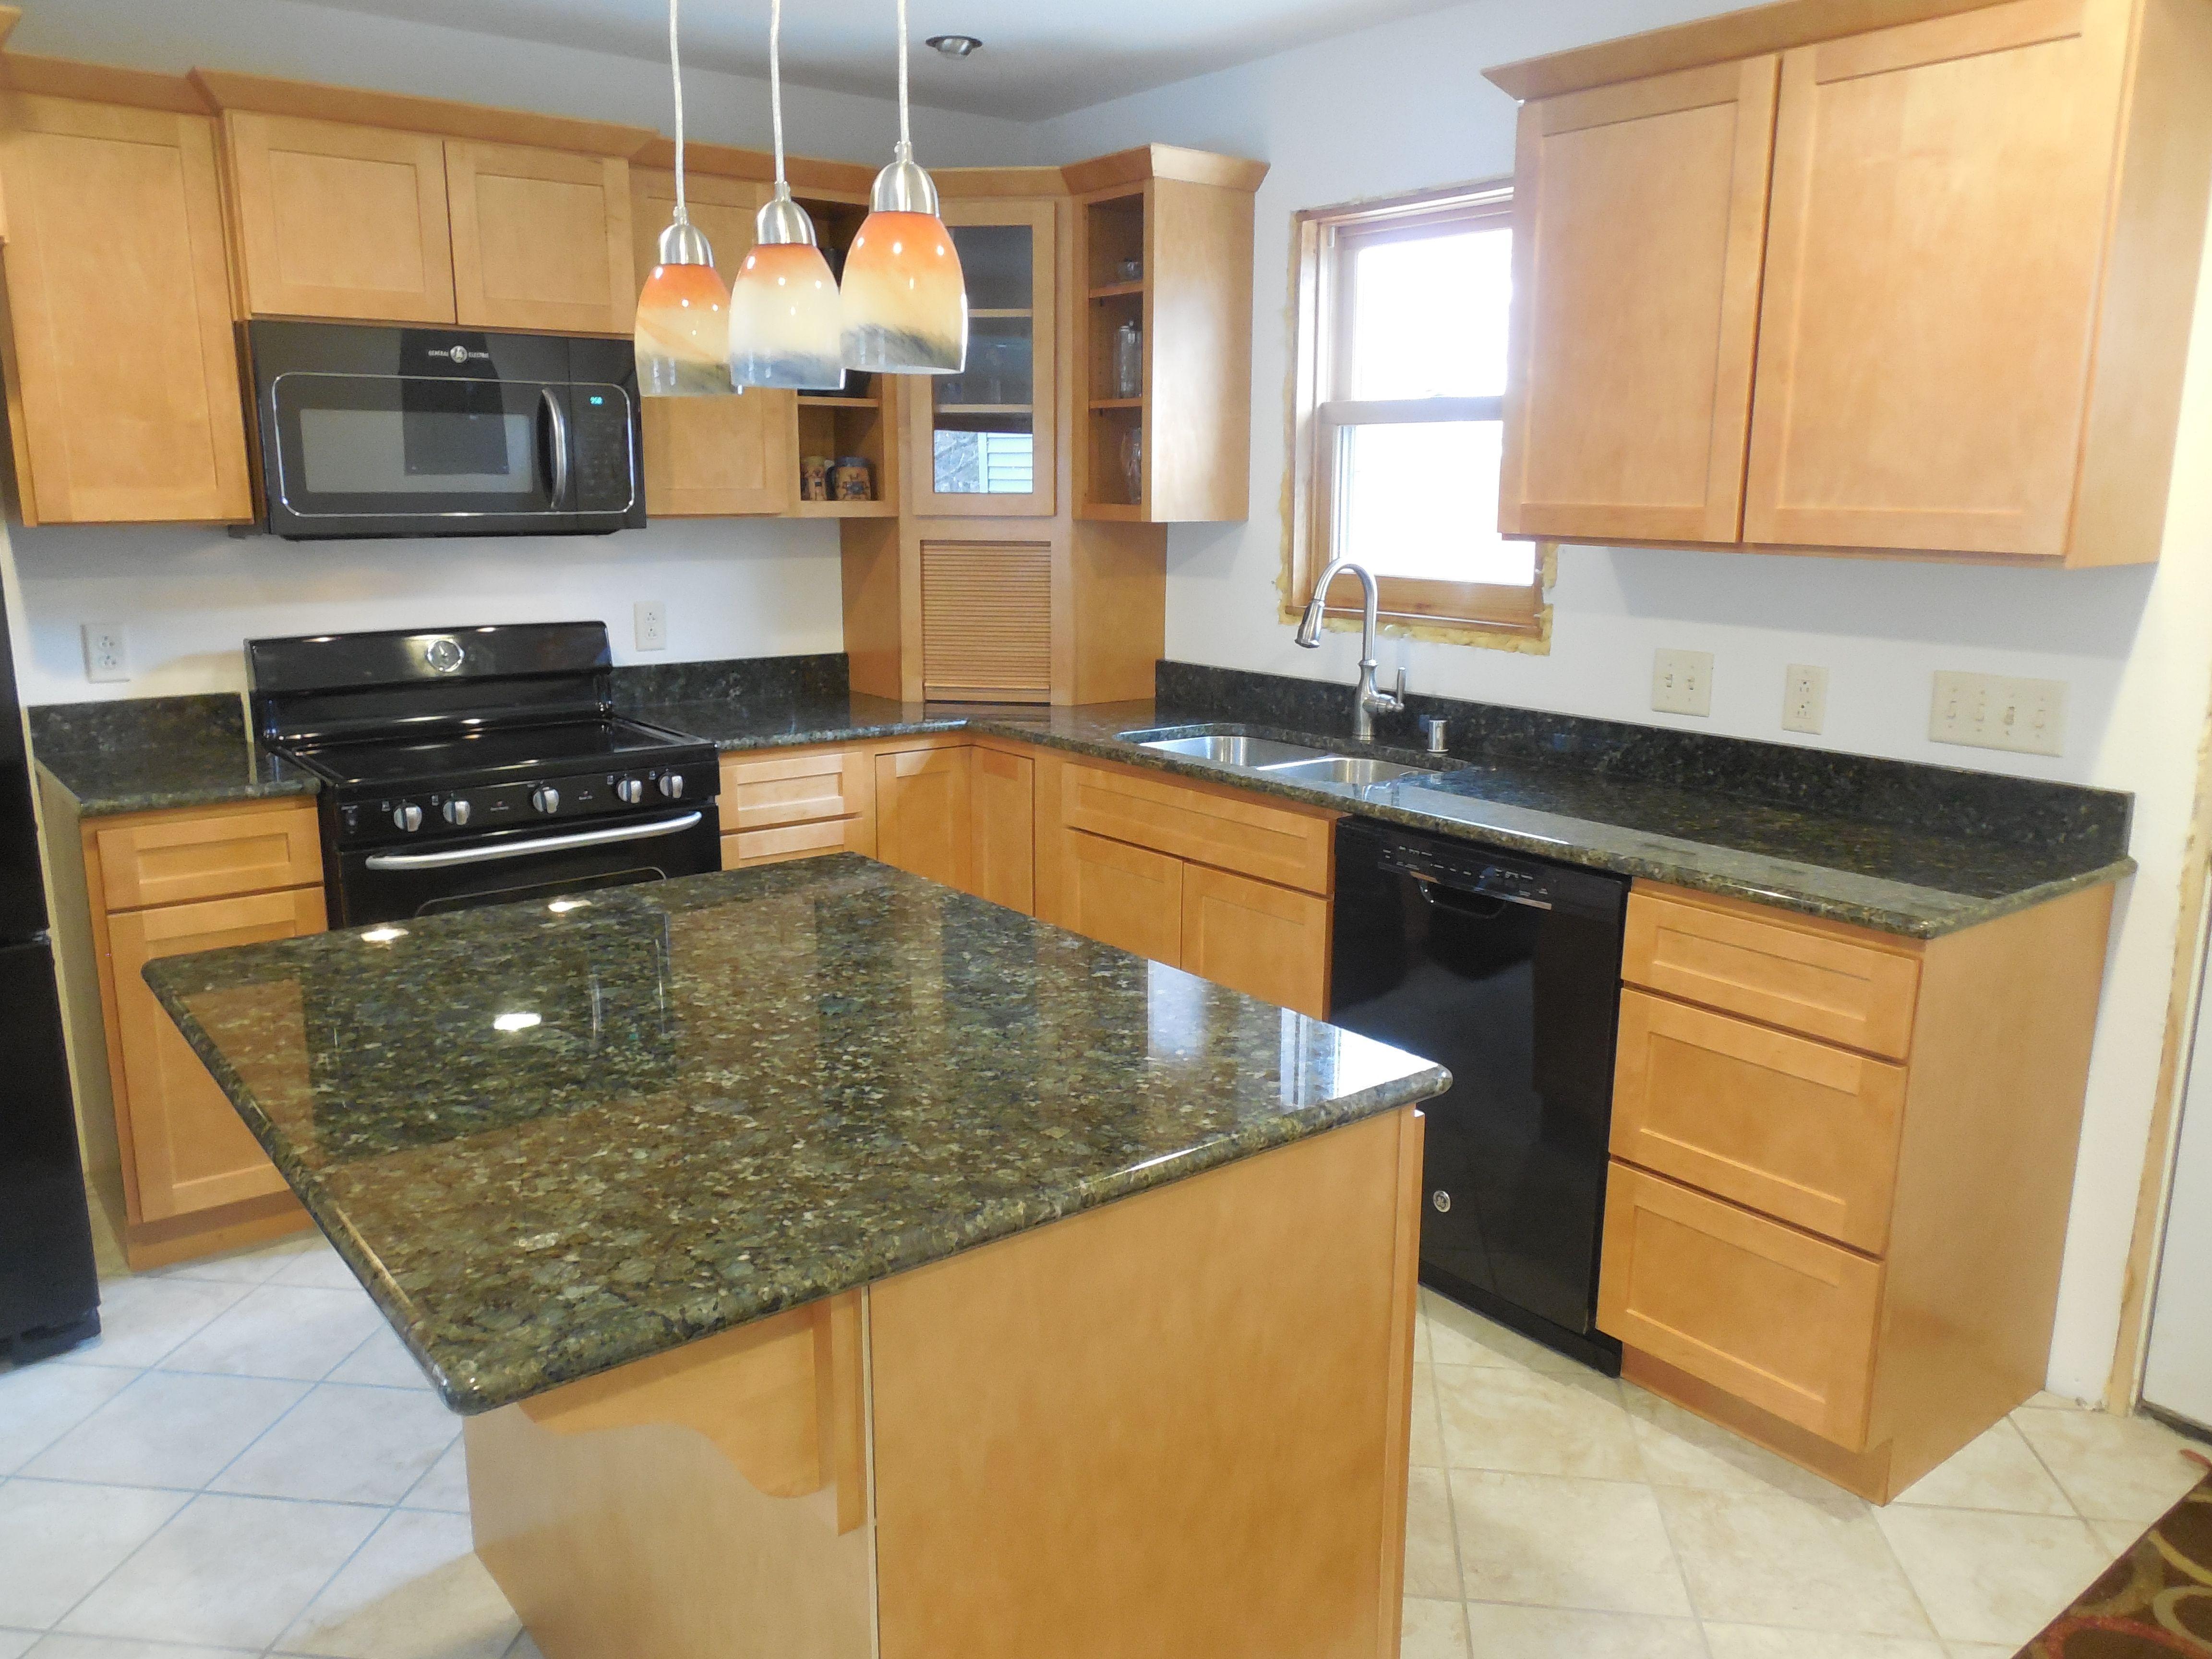 Kitchen Remodel With Bedrock Granite Countertops Rebekah L From Germantown Installation